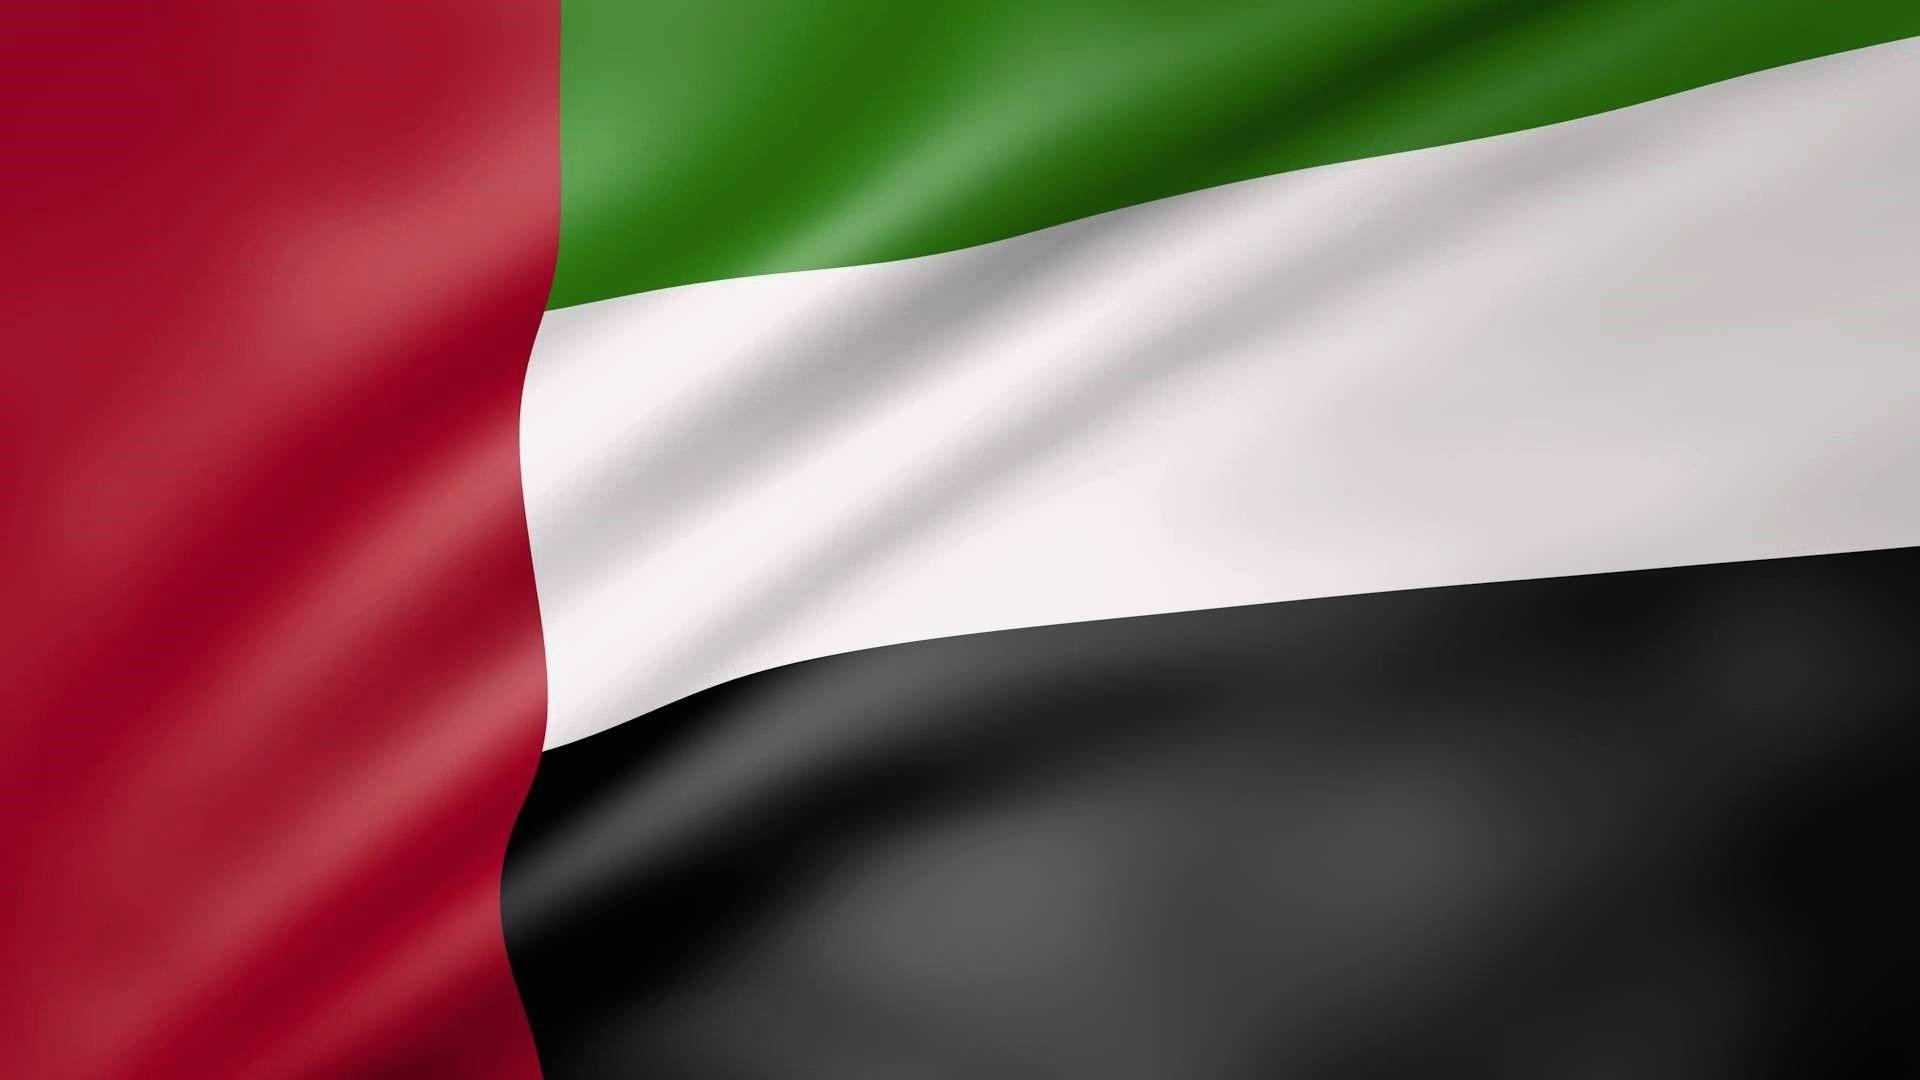 Image 20190402 105002 United Arab Emirates 296 Tourism Unitedarab Emirates United Arab Emirates Per Infor Emirates Flag United Arab Emirates United Arab